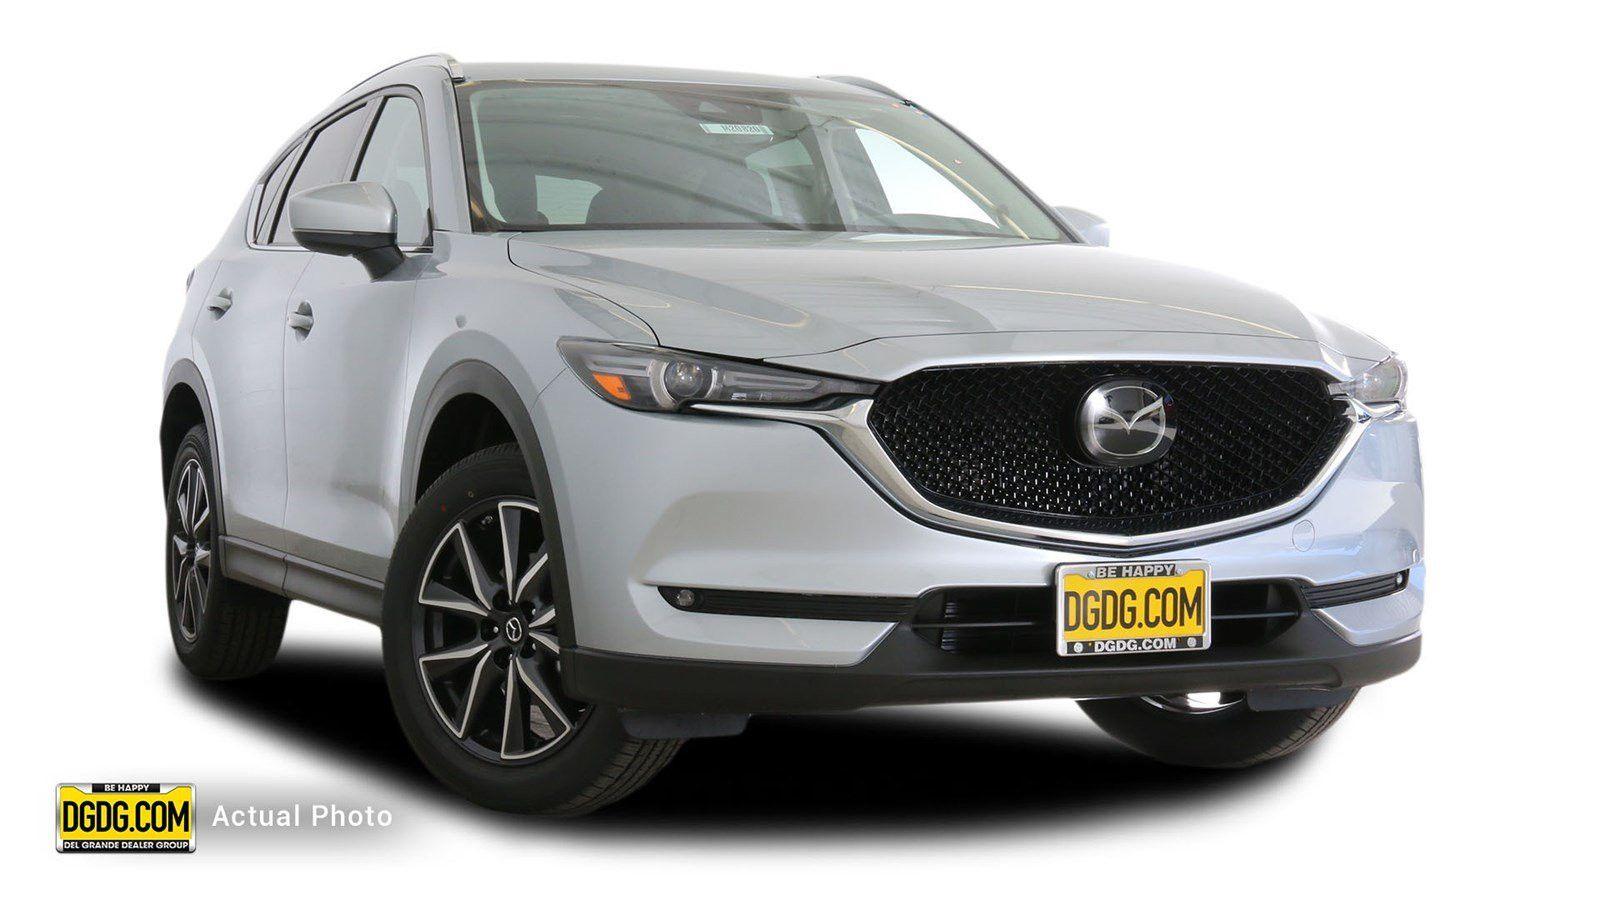 2020 Mazda Cx 9 2020 Mazda Cx 9 Mazda Cx 5 2020 Release Date And With Images Mazda Mazda Cx 9 Mazda Suv